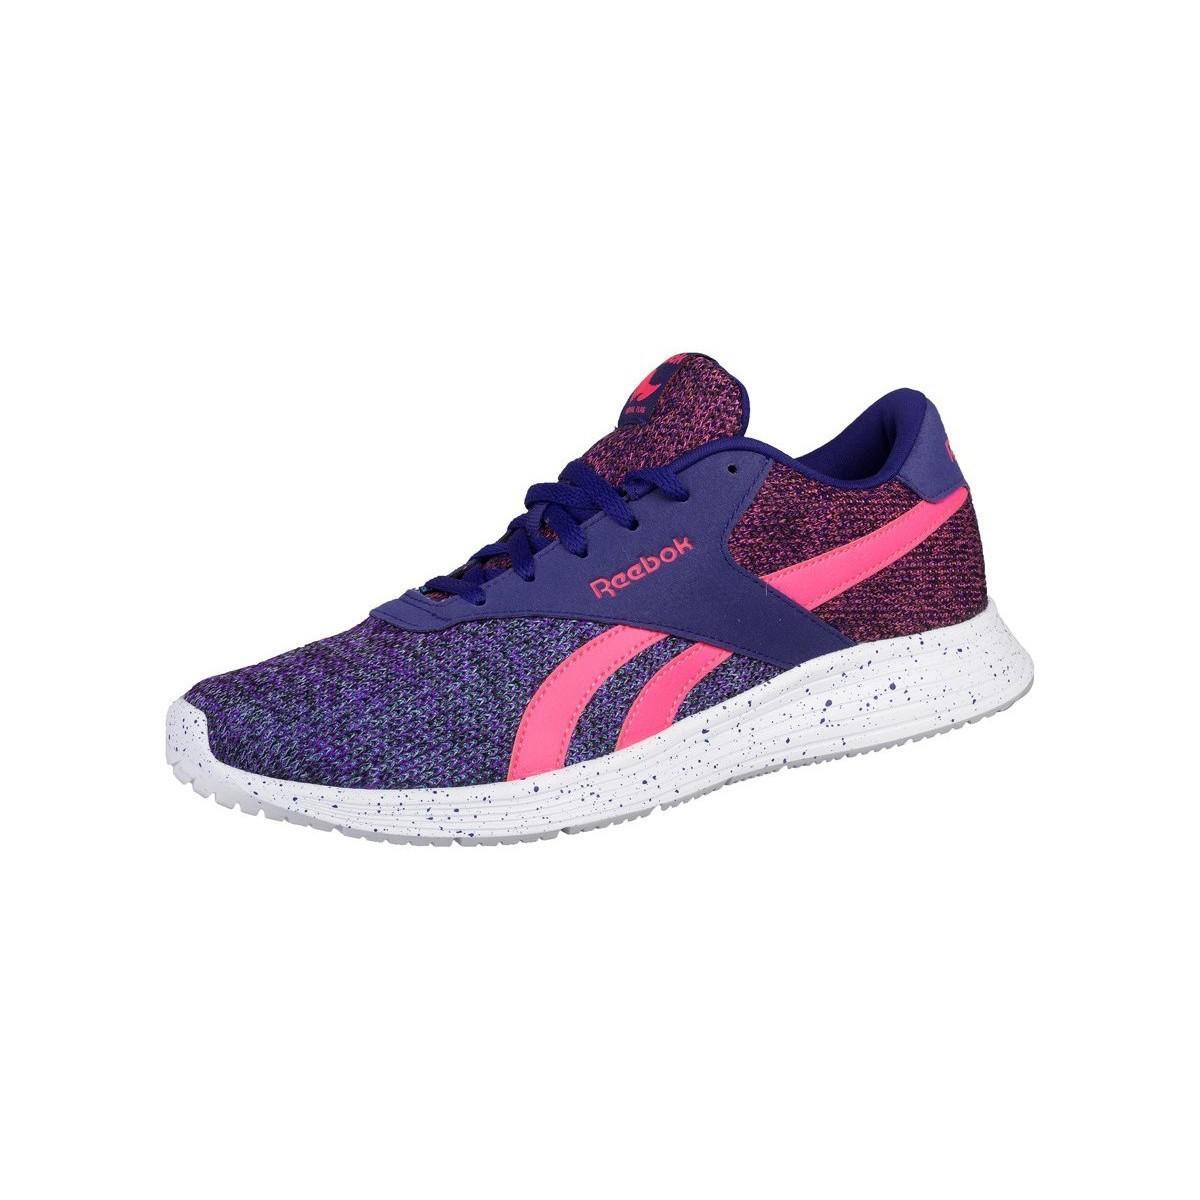 67b11861c708 Reebok Royal Ec Ride Fs Women s Shoes (trainers) In Pink in Pink - Lyst